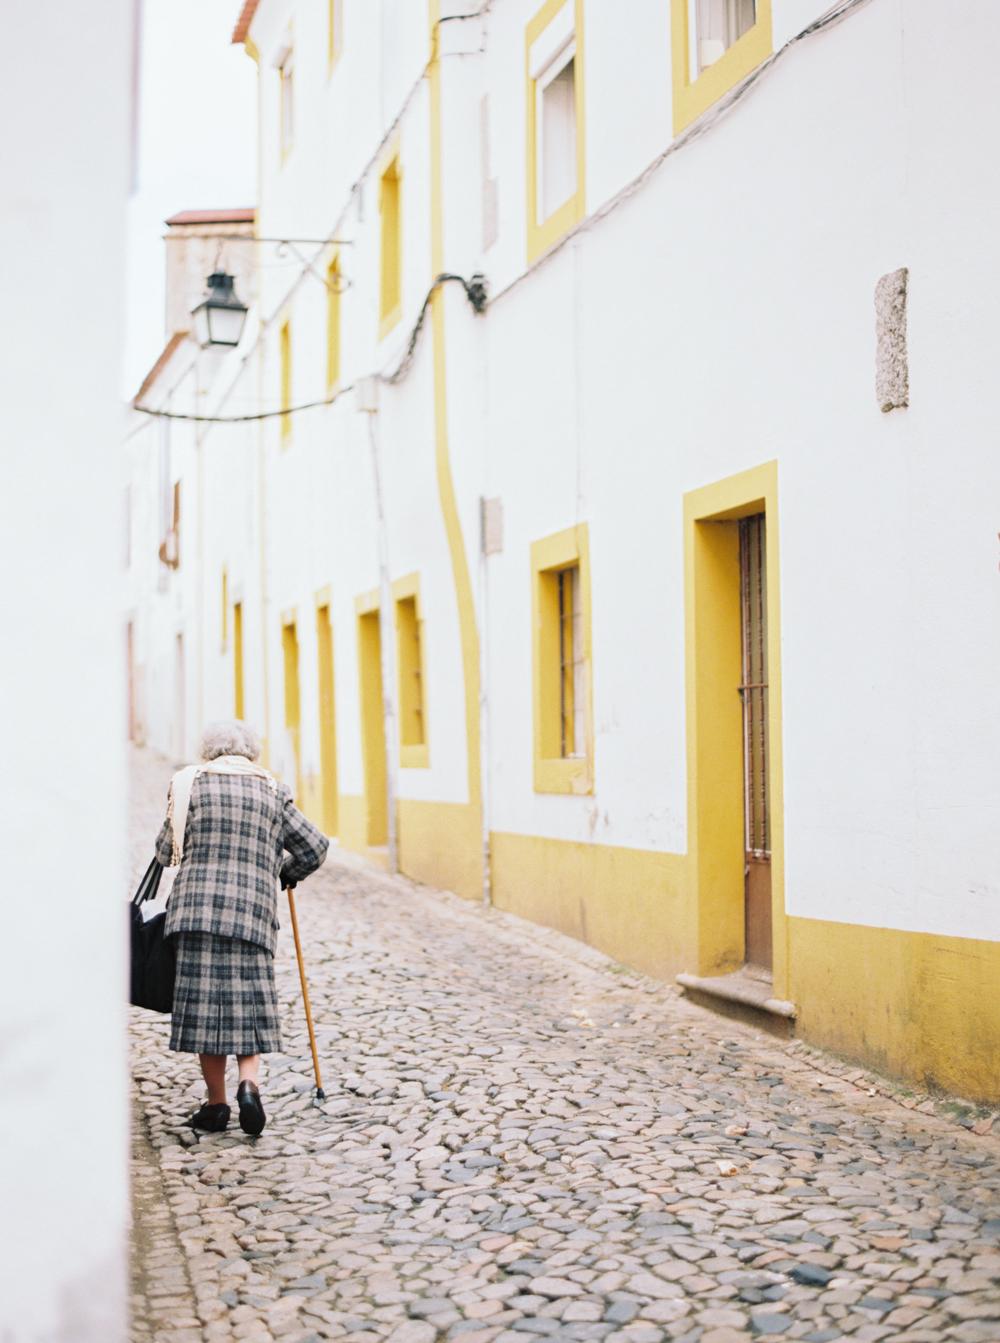 0162-Portugal.jpg